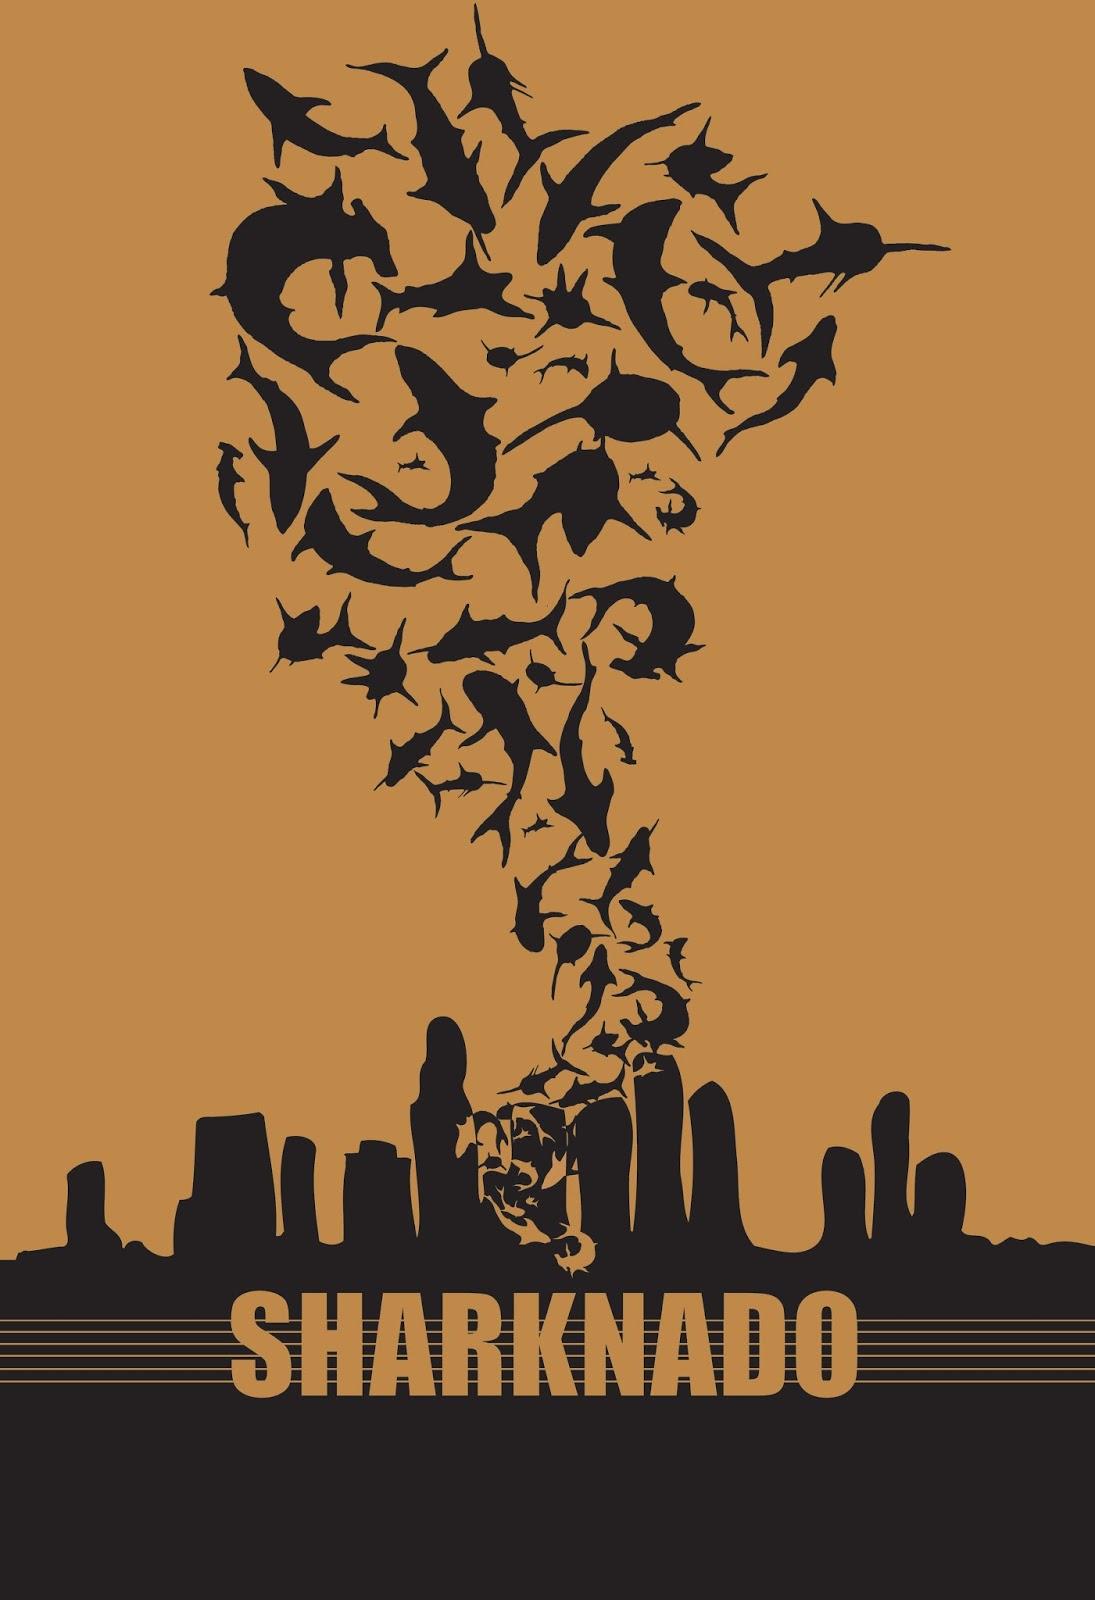 Sharknado poster Jeremy Gaulkenstei